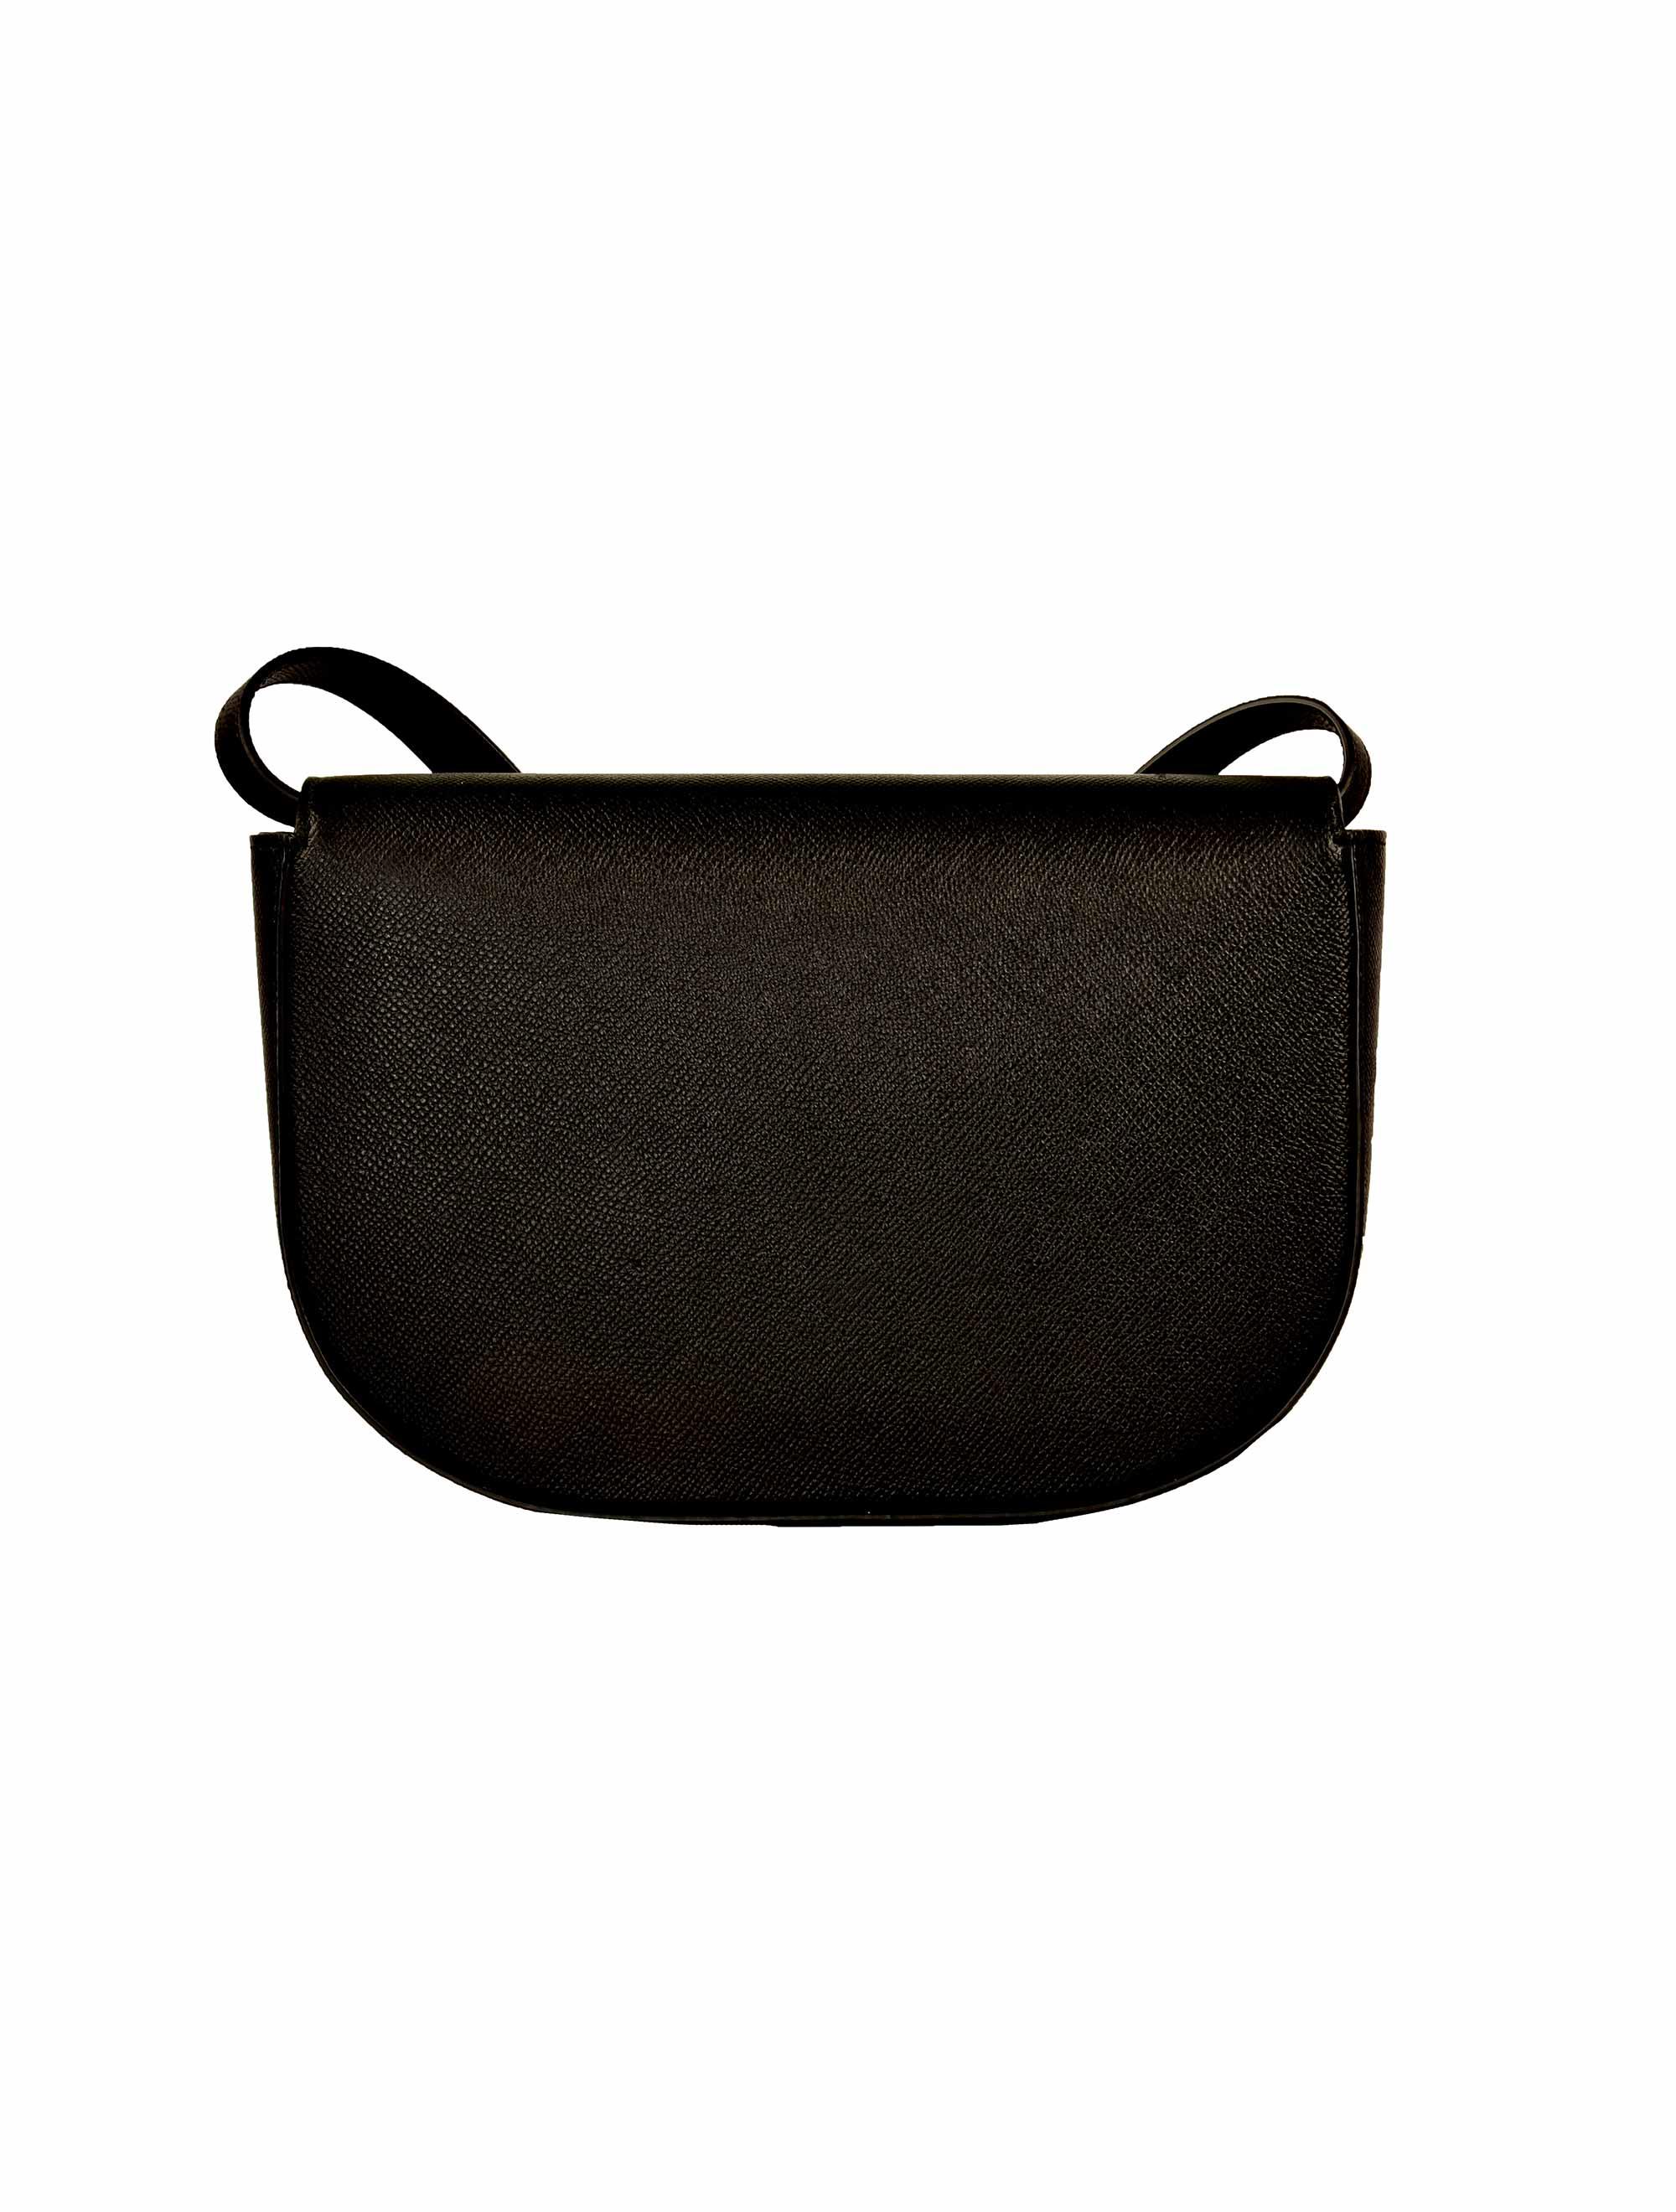 Picture of Balenciaga | Ville Day Bag S